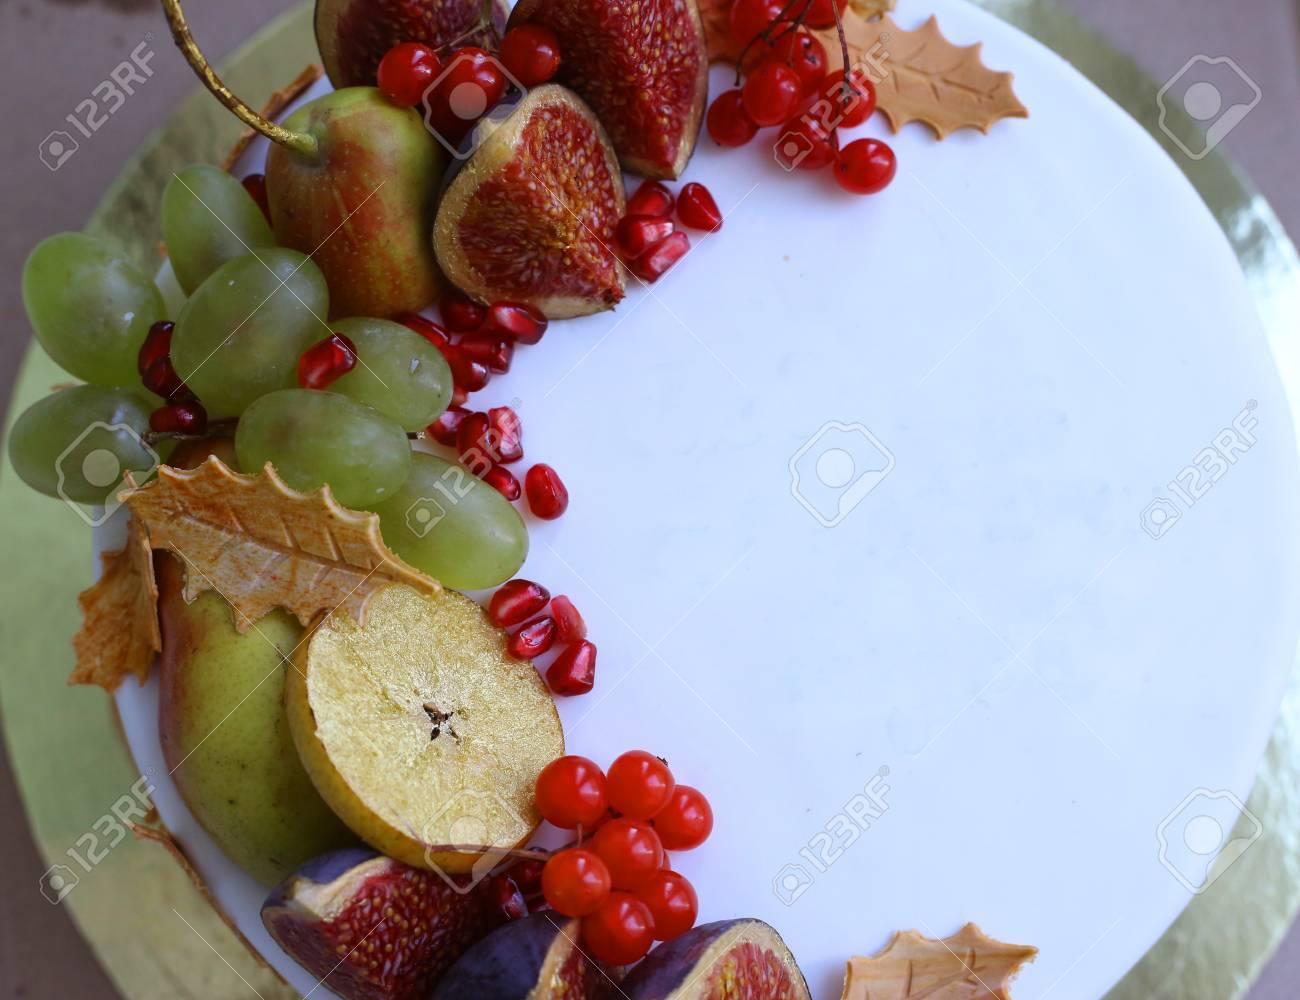 Autumn Fruit Frame Apple Pearfig Pomegranate Viburnum Cut